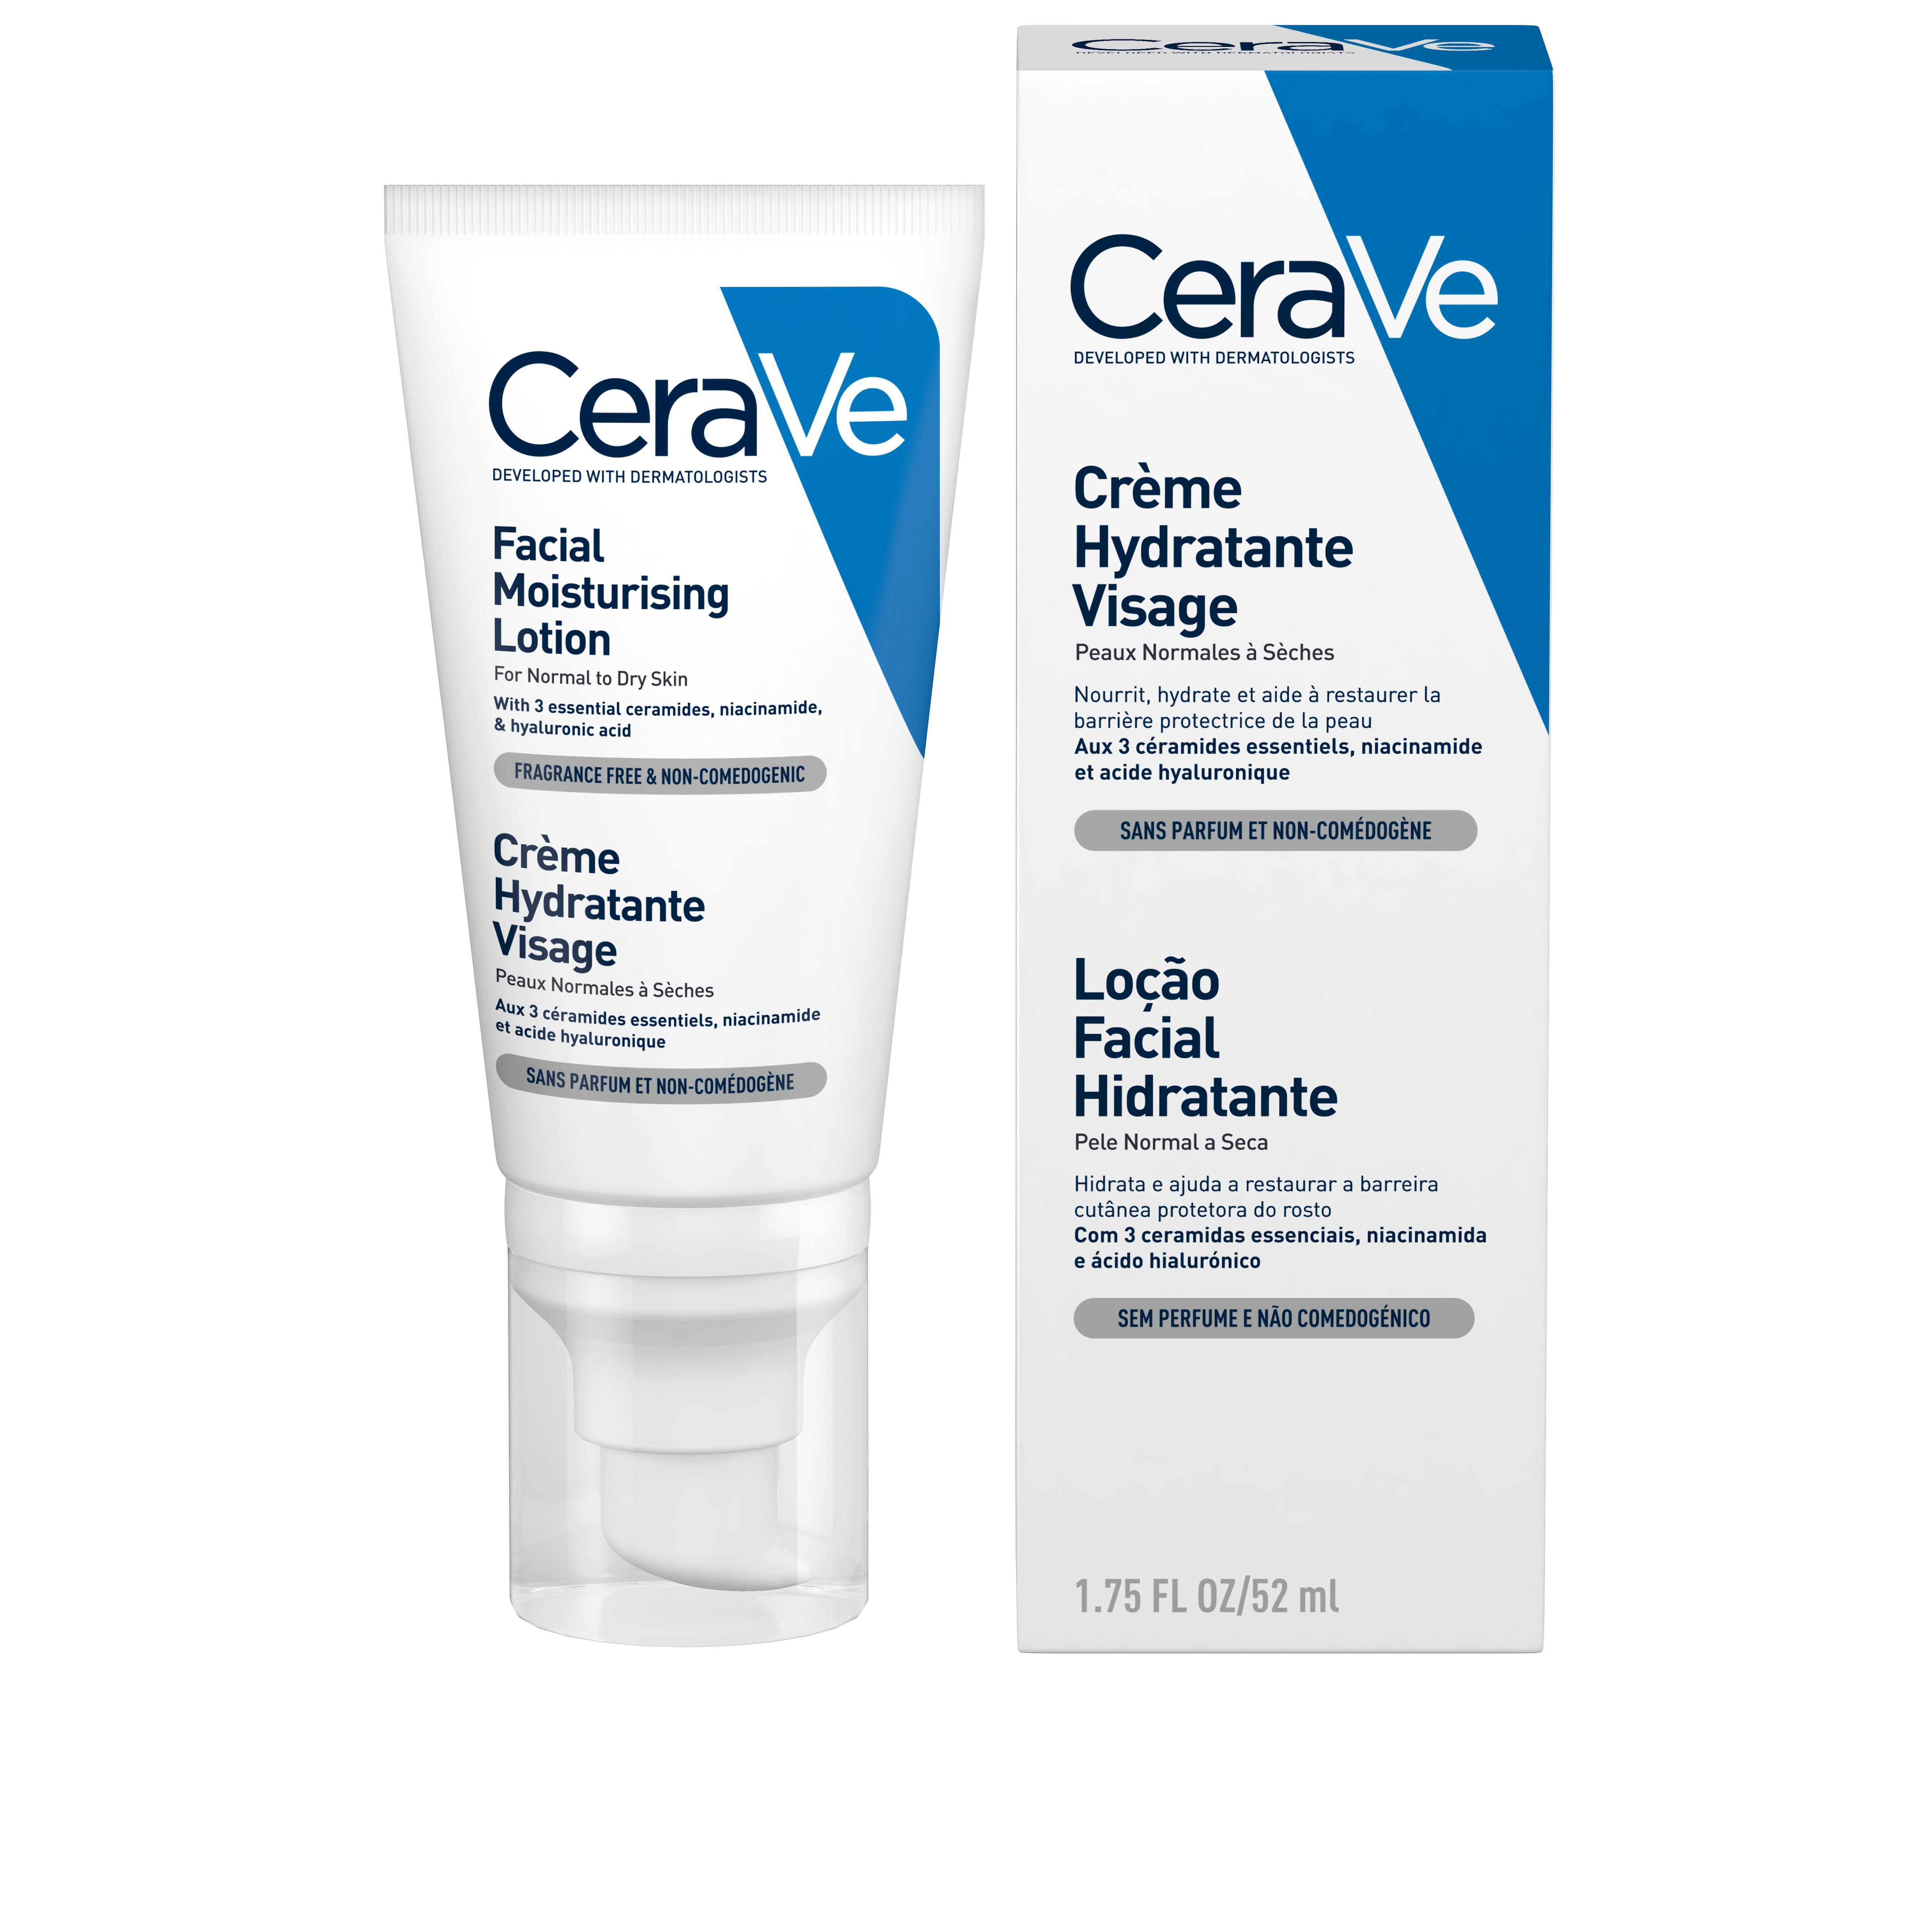 Image of Cerave crème visage hydratante